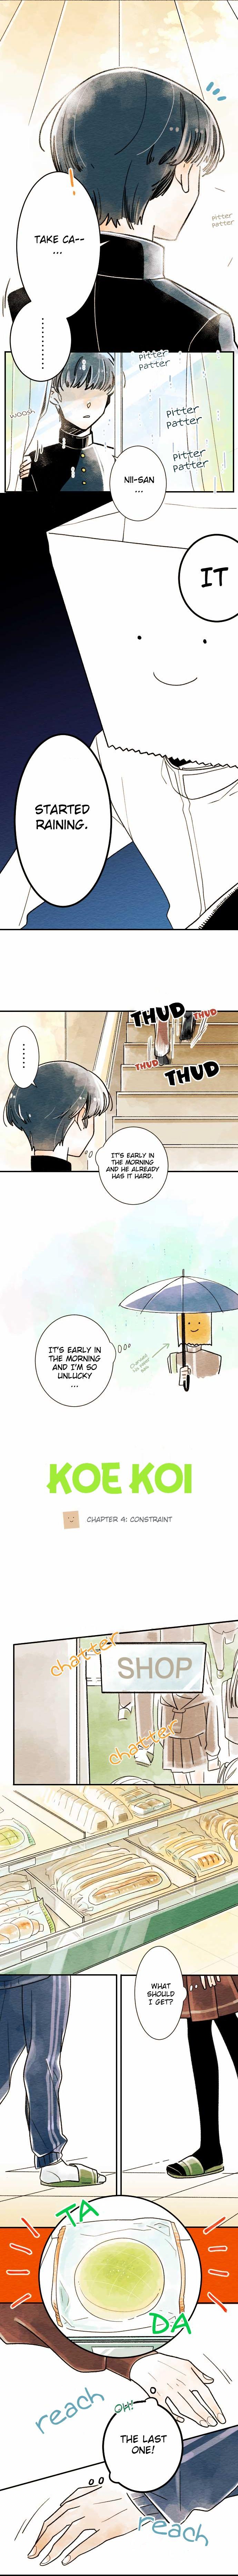 Koe Koi 4 Page 2